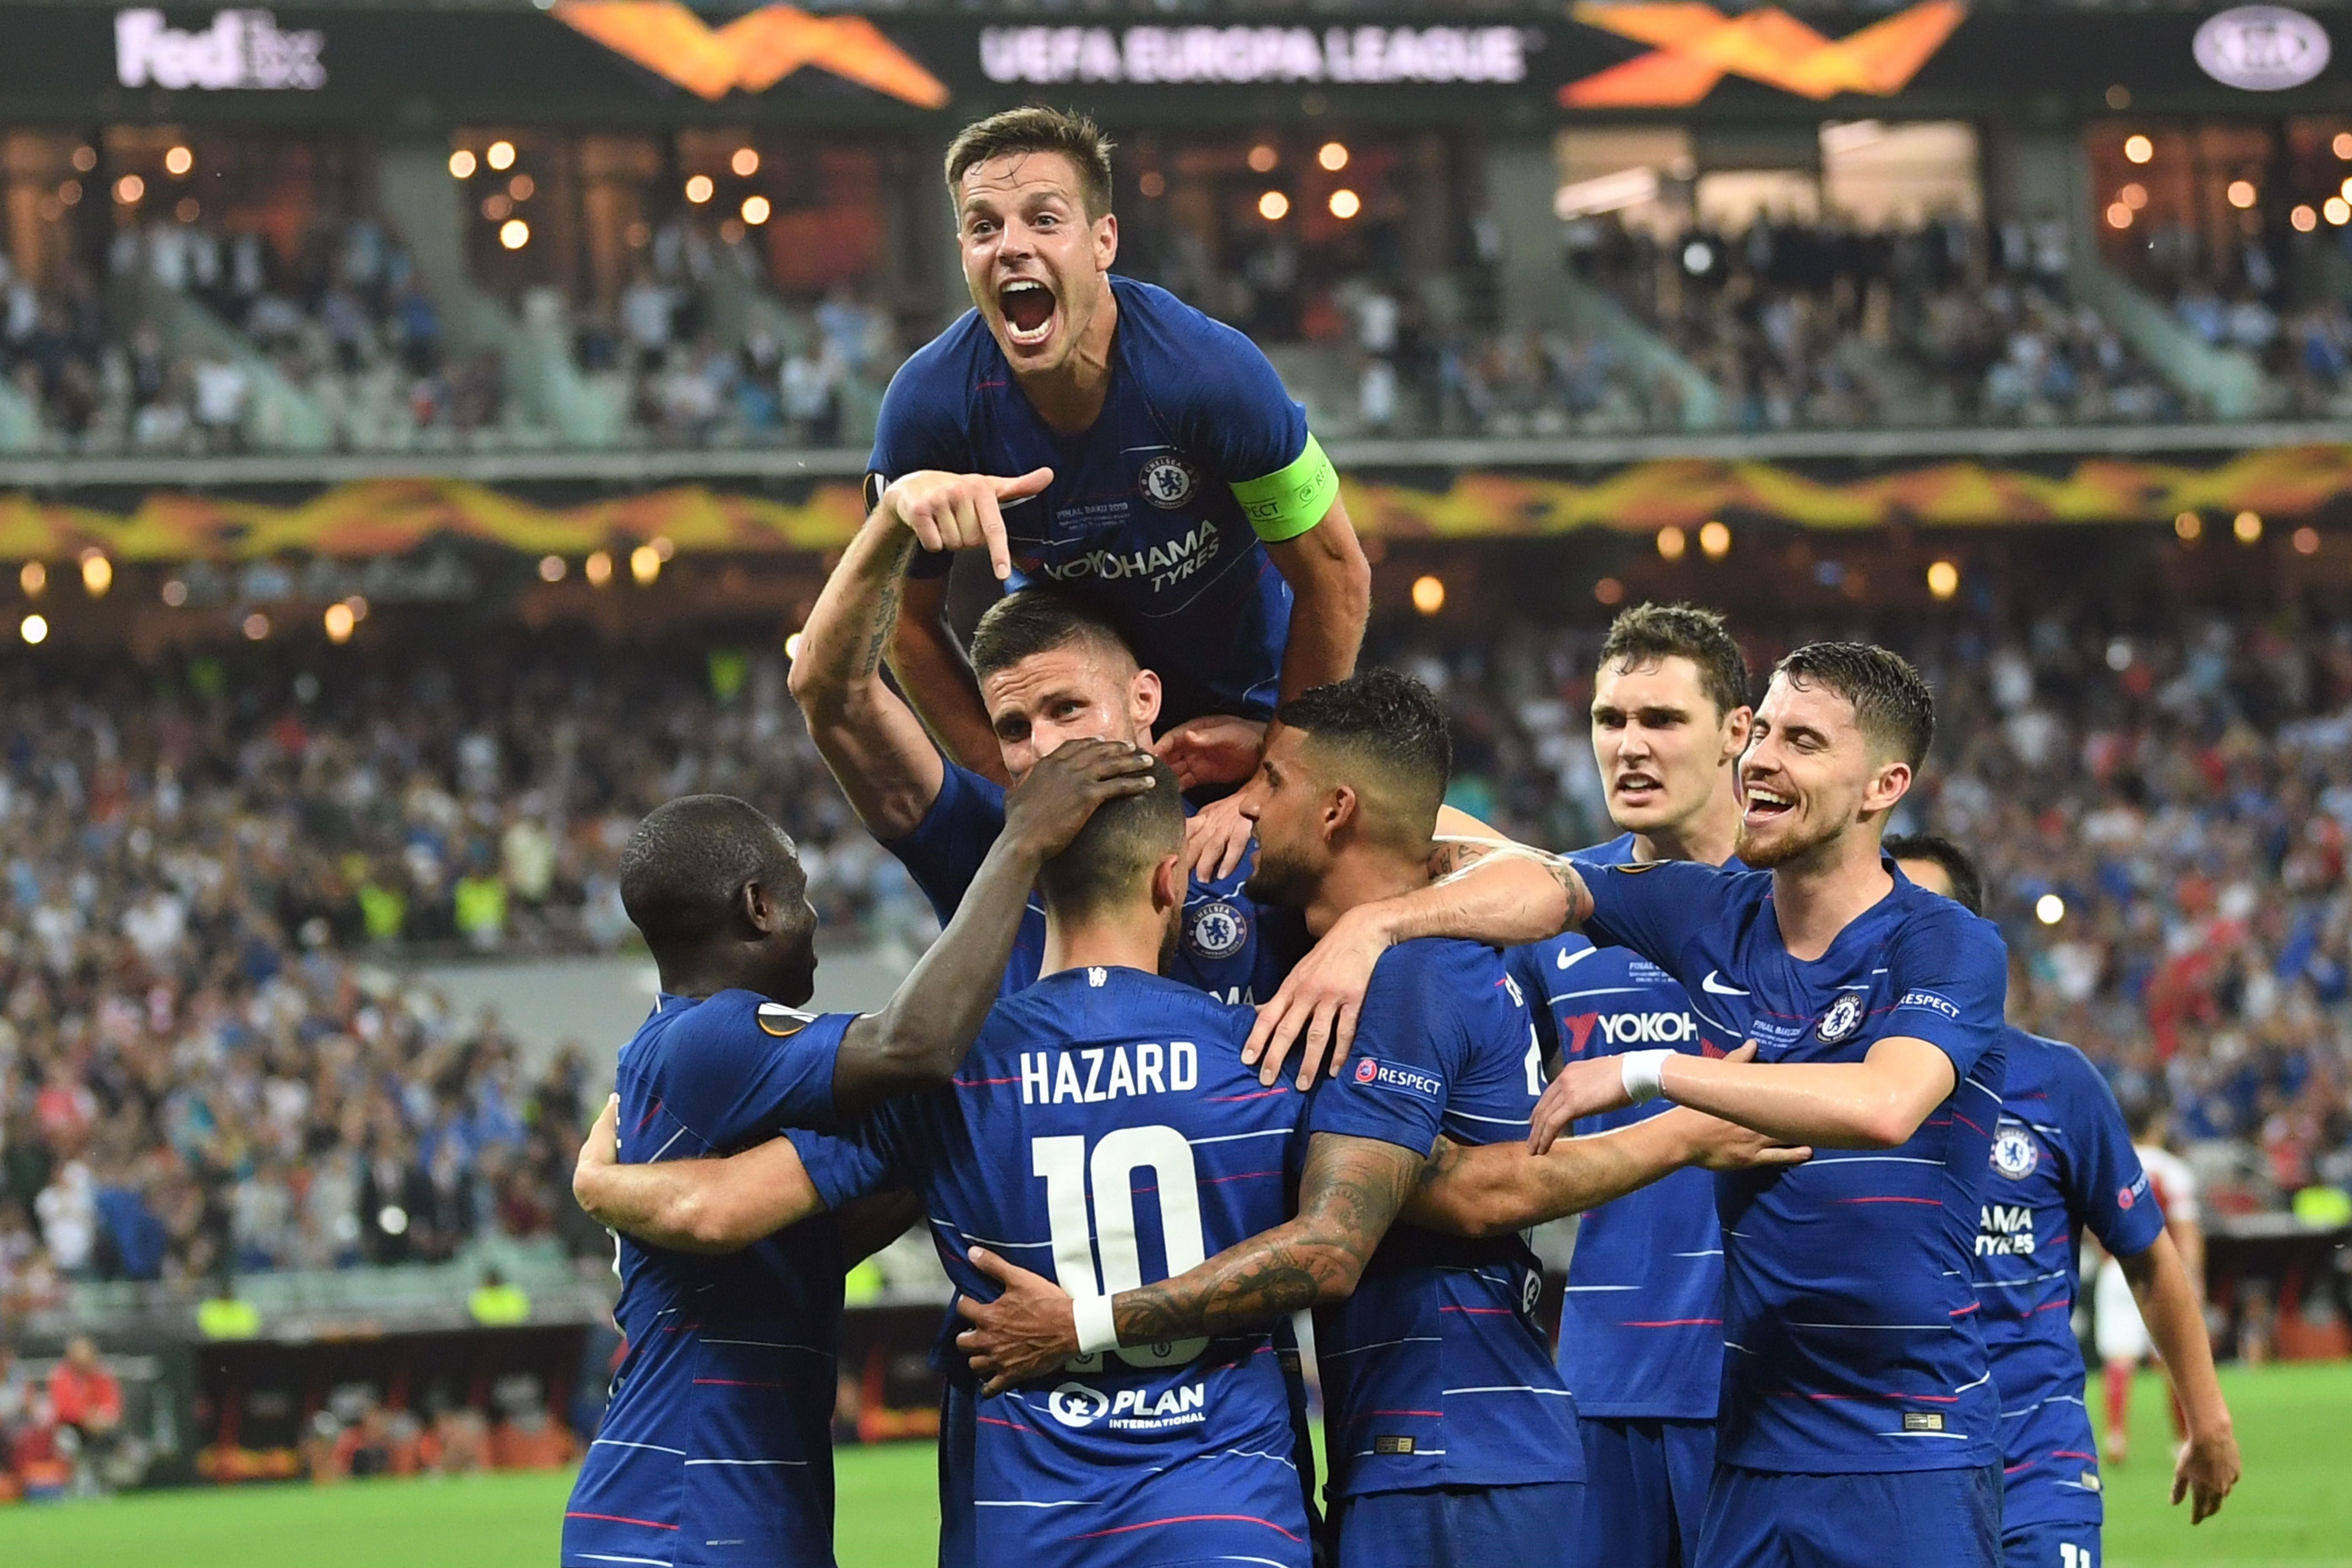 Olivier Giroud lors de la finale Chelsea-Arsenal - Europa League 2018/2019 - Getty Images